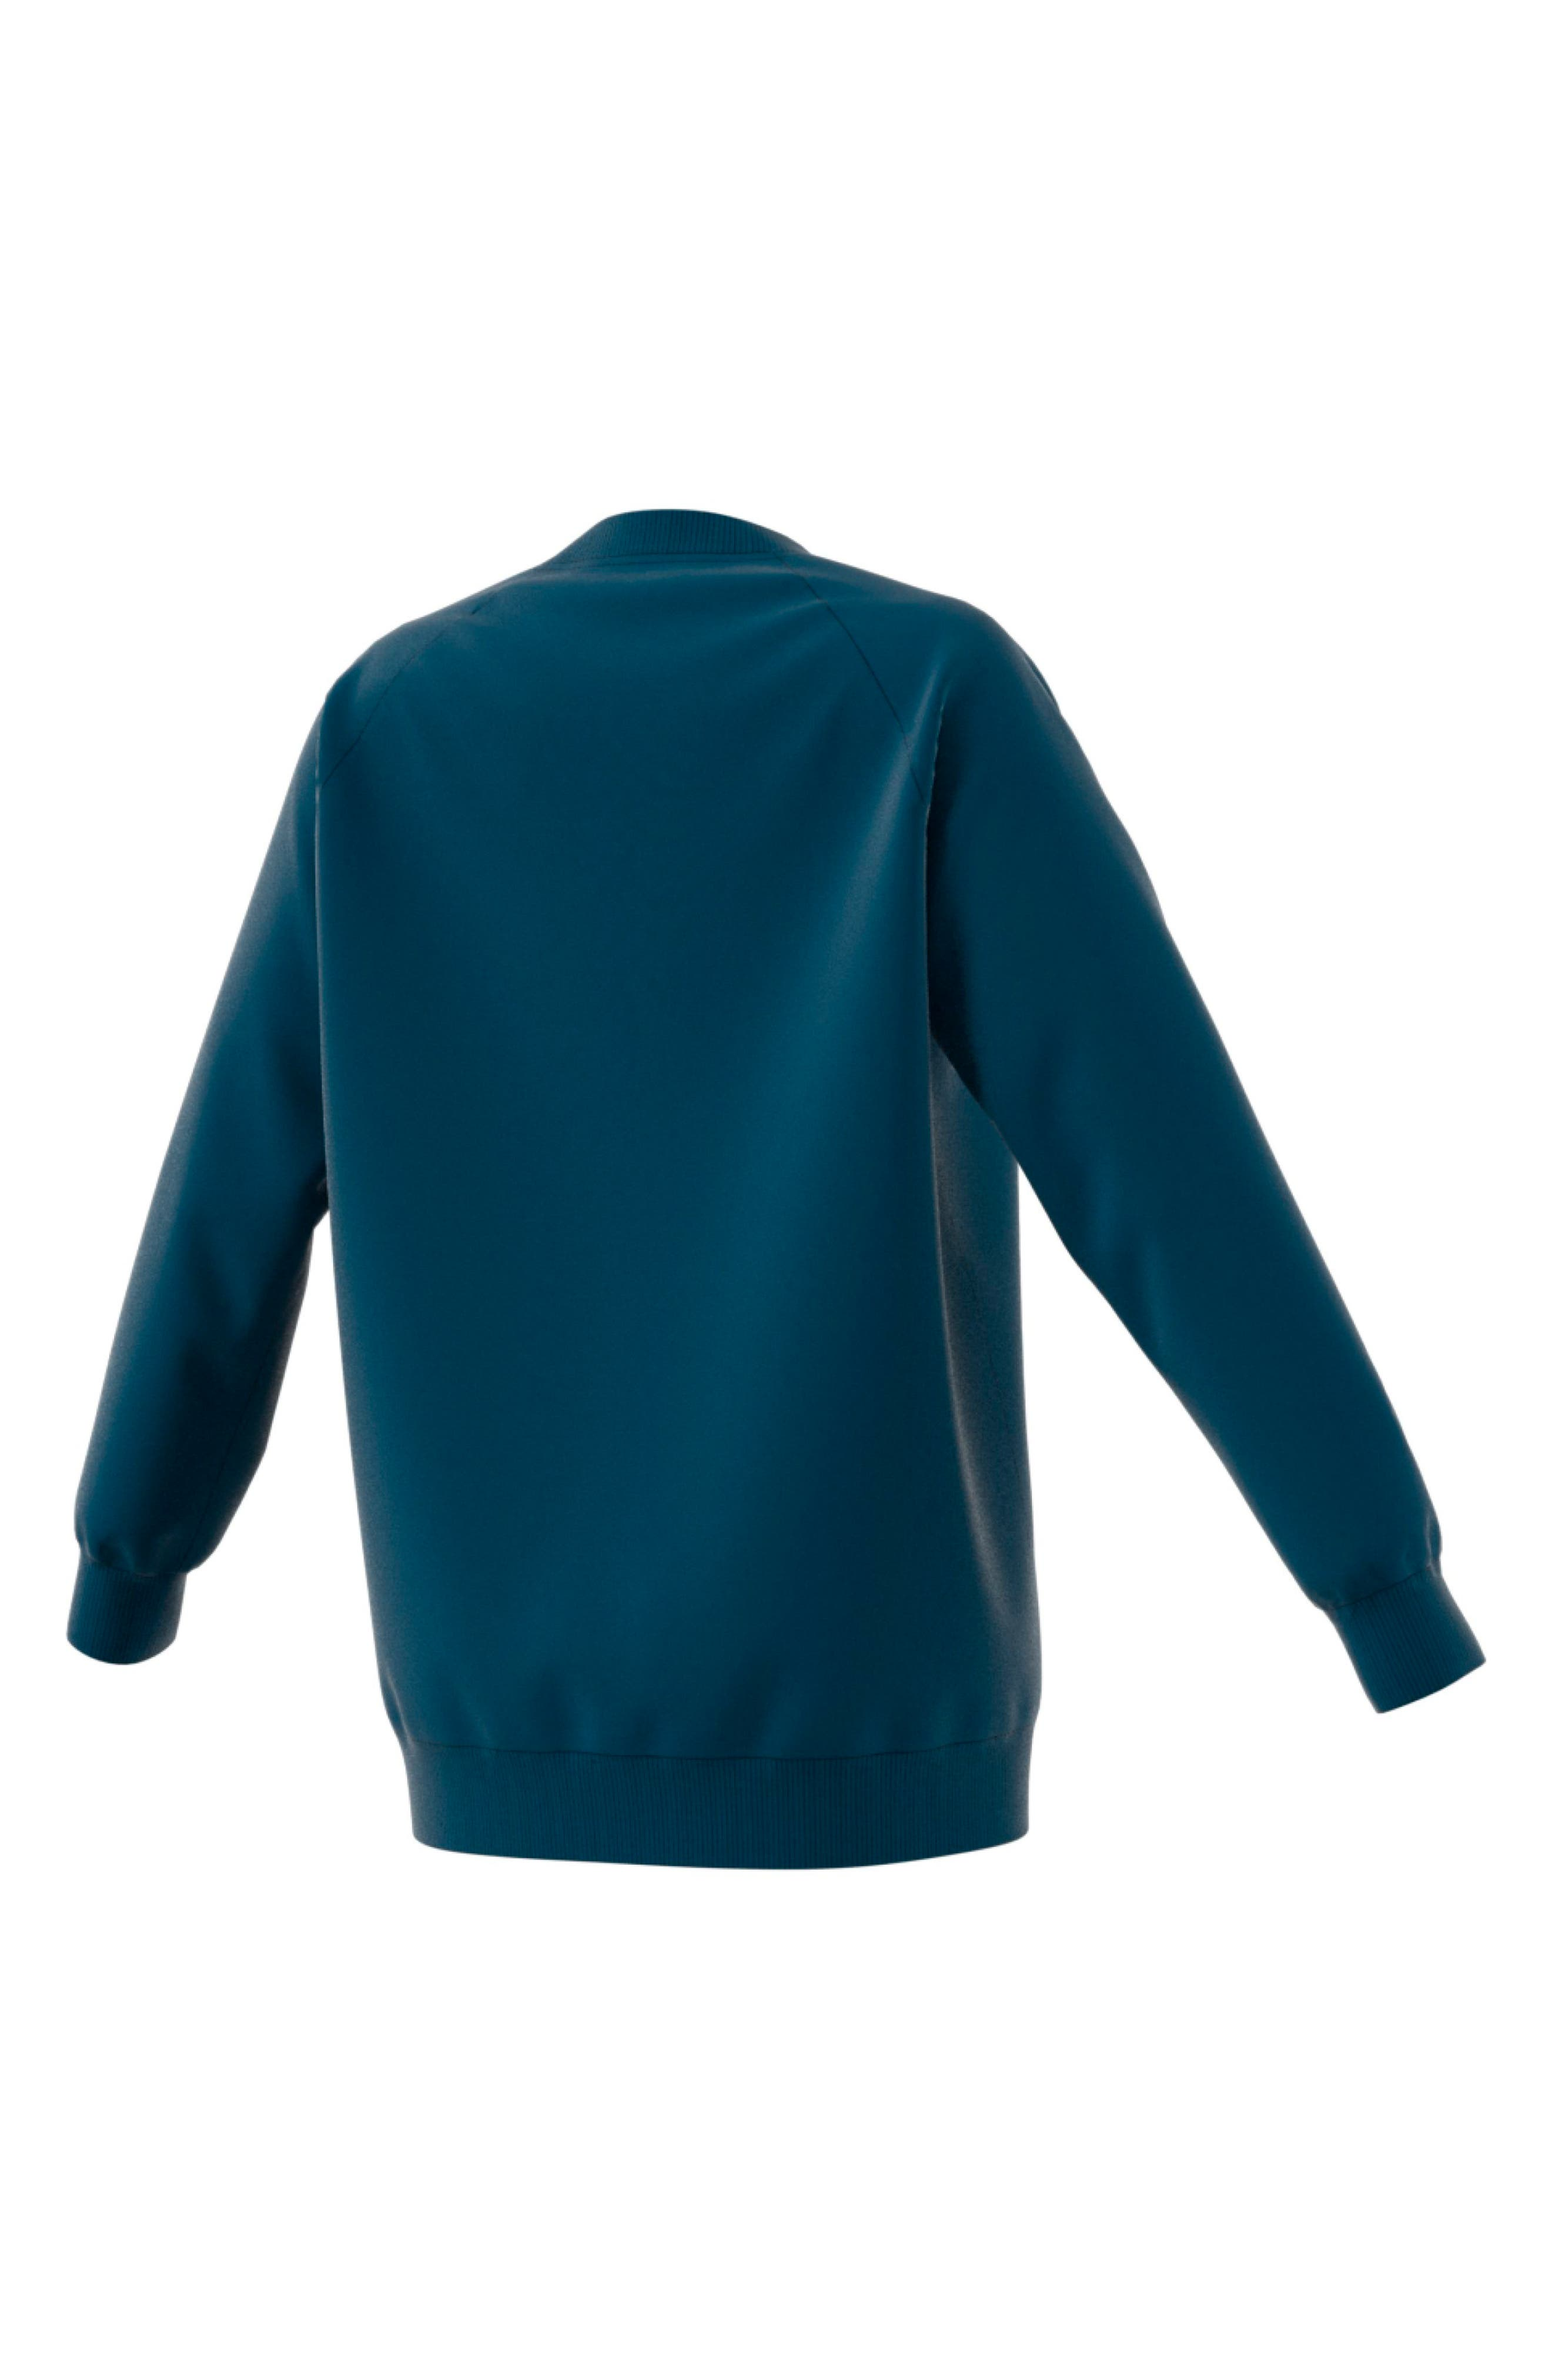 Originals Oversize Sweatshirt,                             Alternate thumbnail 8, color,                             020